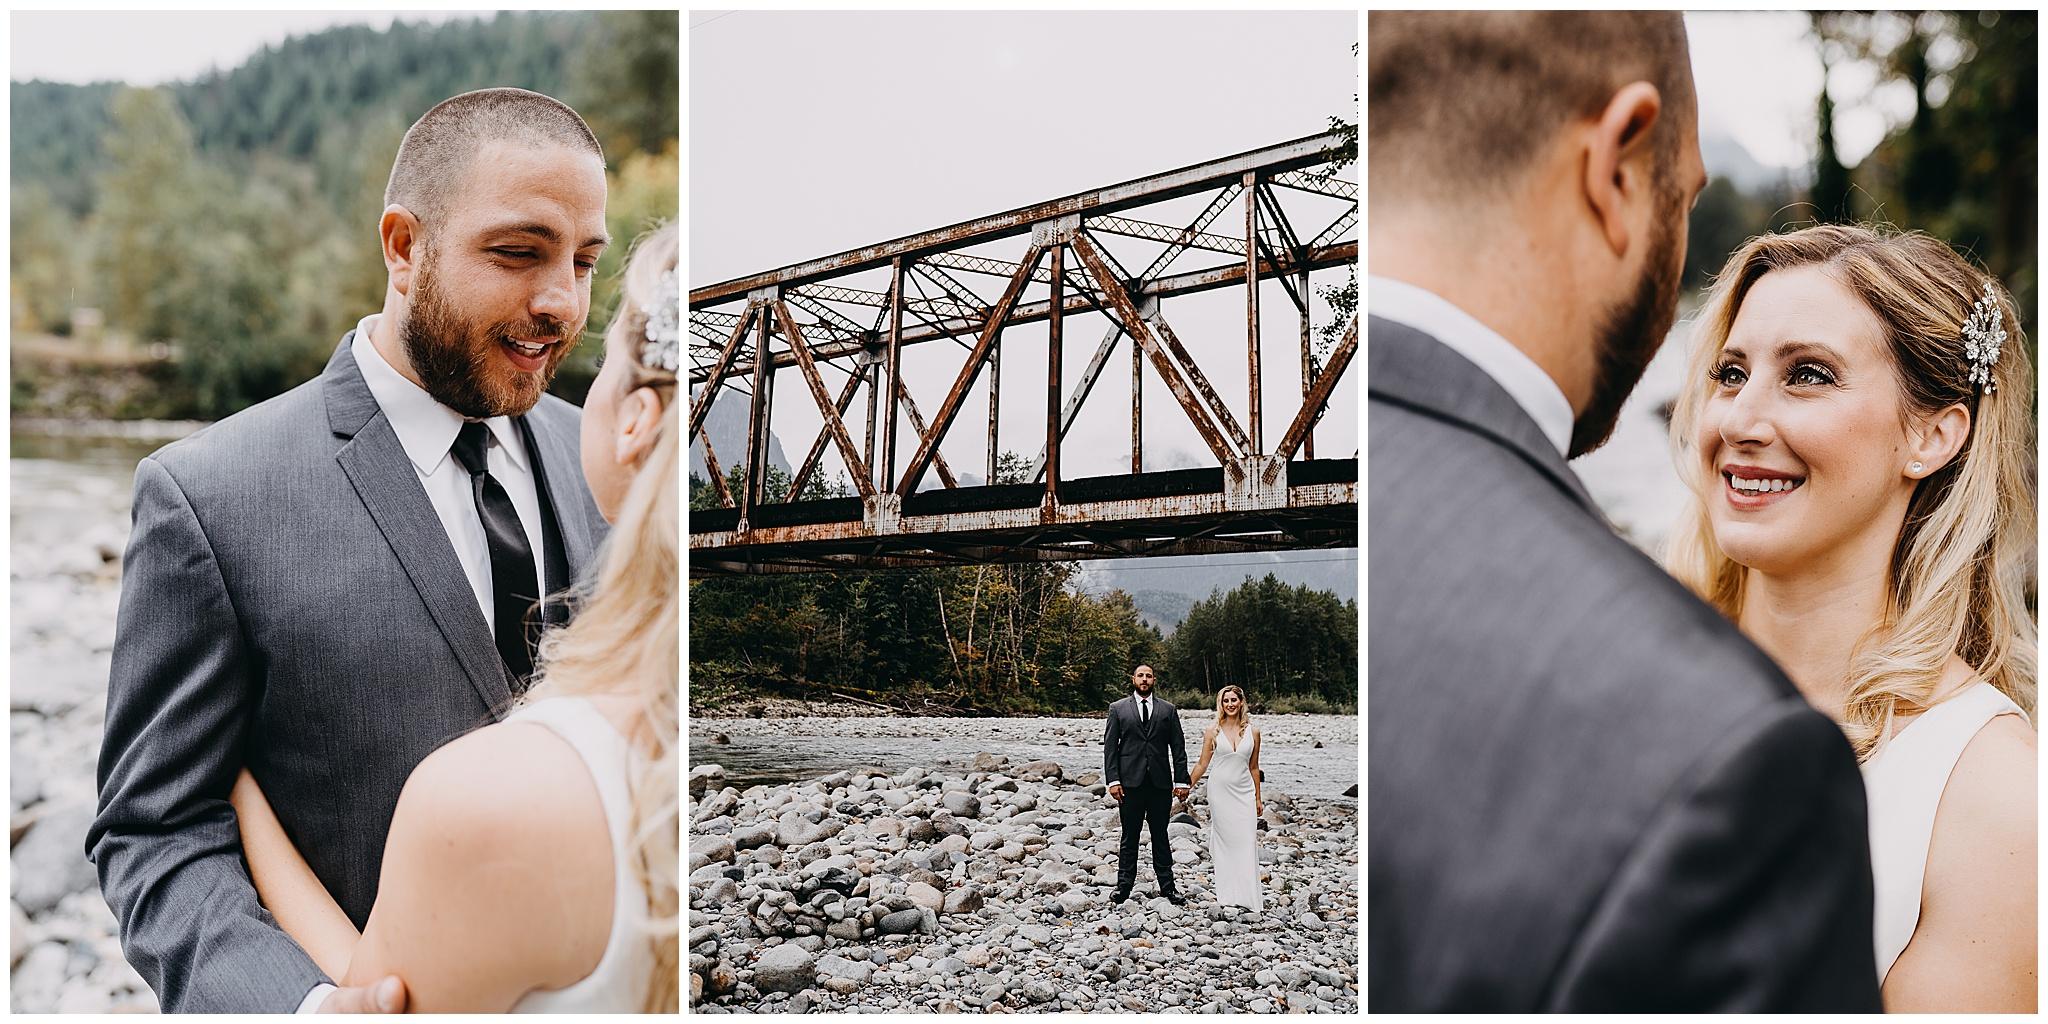 index-wa-wedding25.jpg